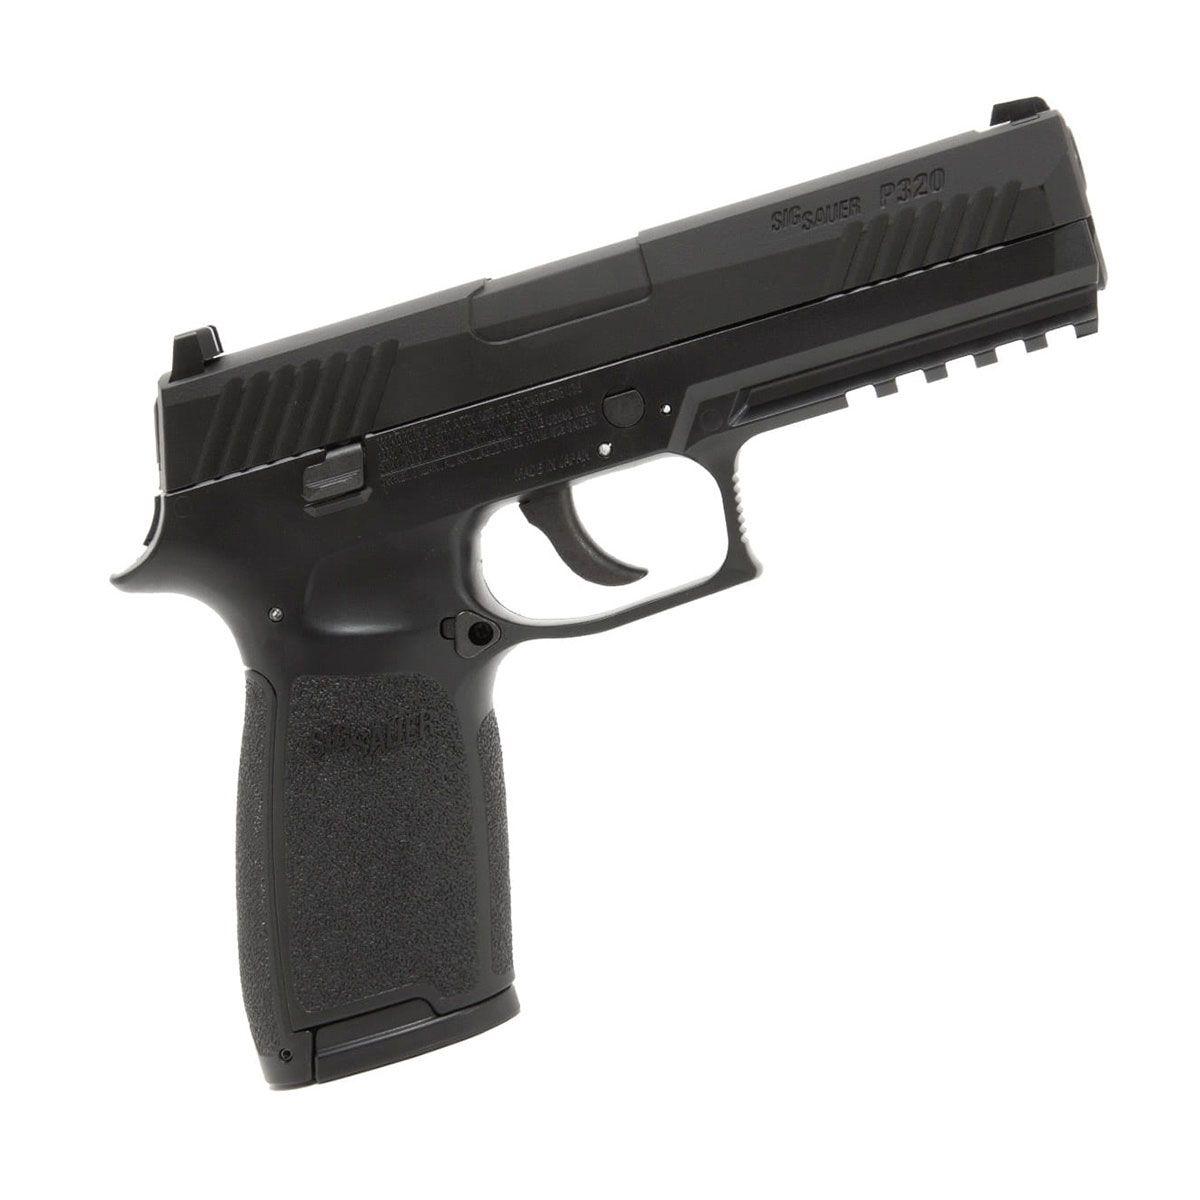 Pistola de Pressão Sig Sauer CO2 P320 Ful Metal - 4,5mm